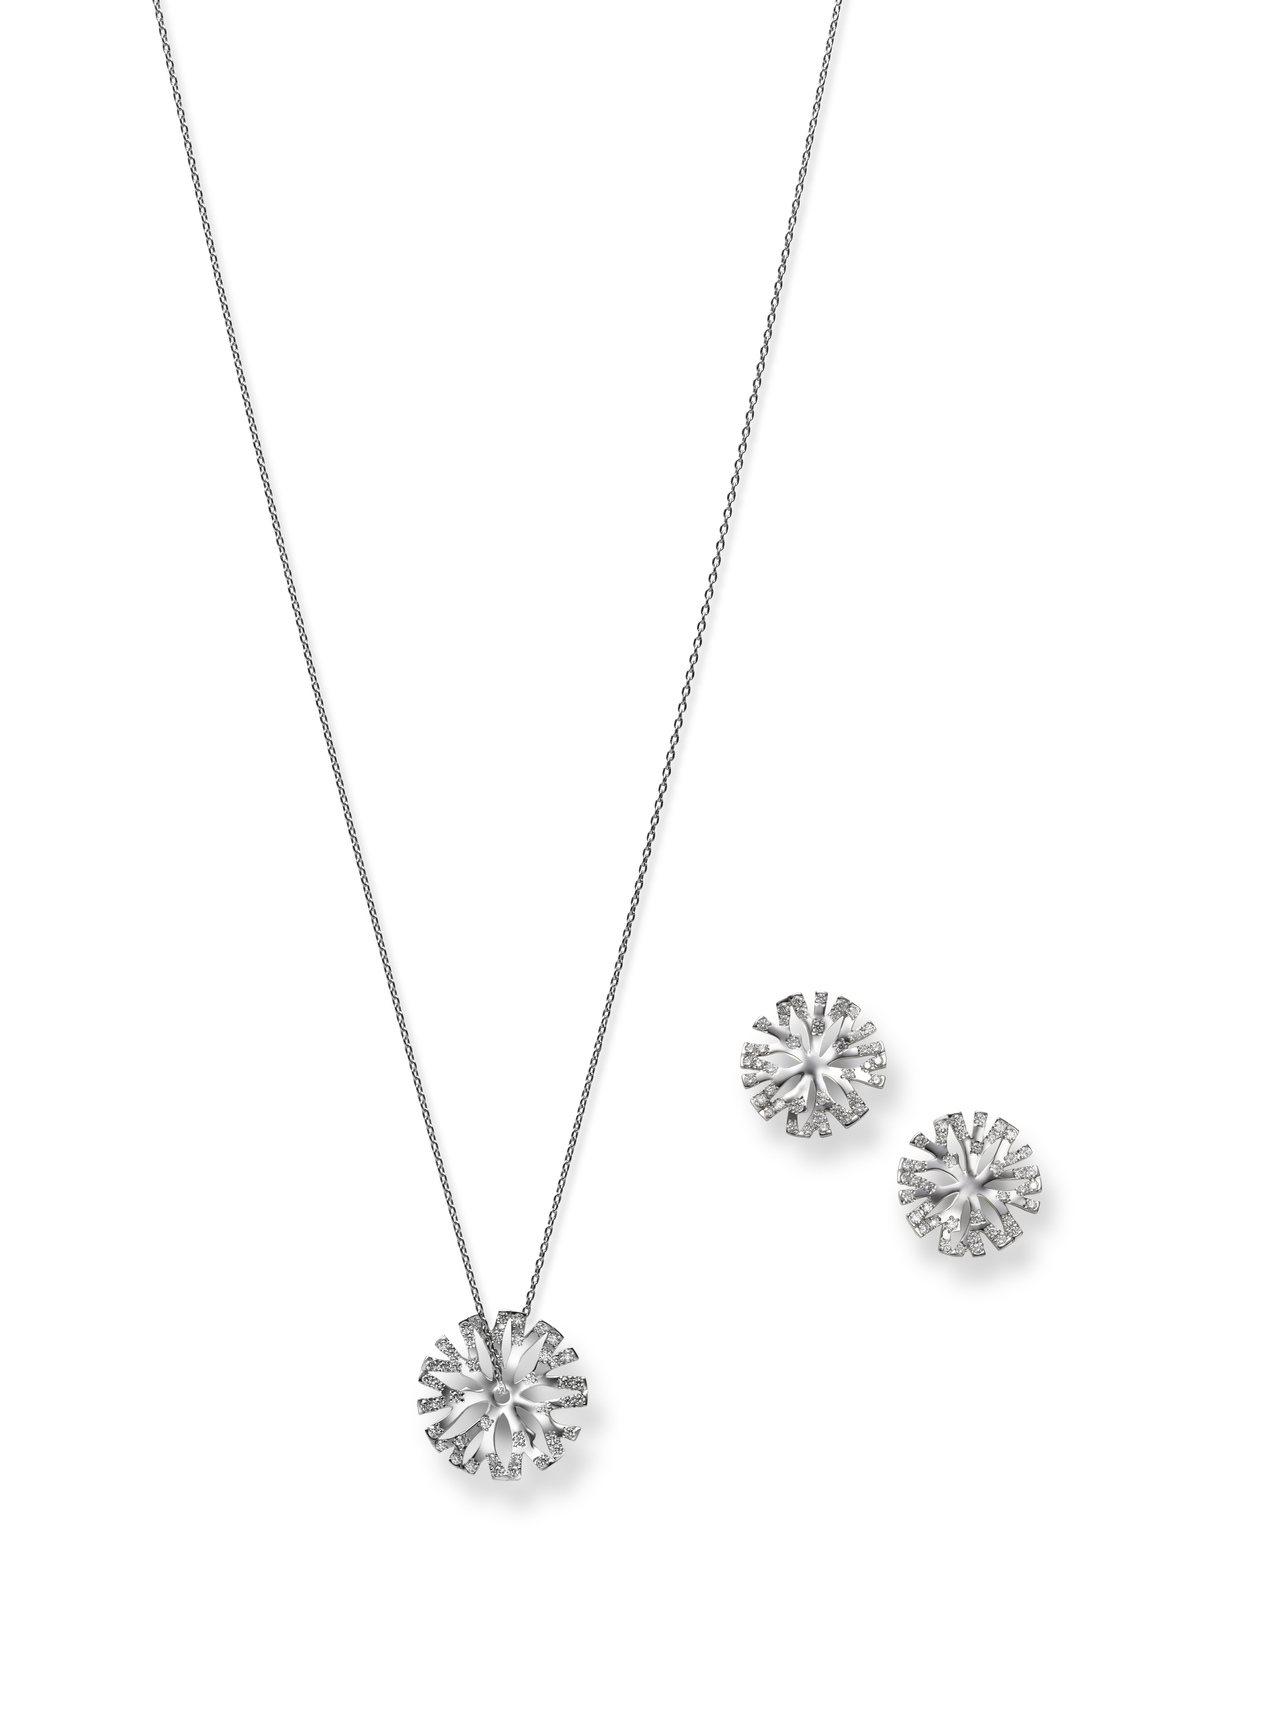 Coral Collection 18K白金鑽石墜鍊及耳環,價格店洽。圖/MIK...